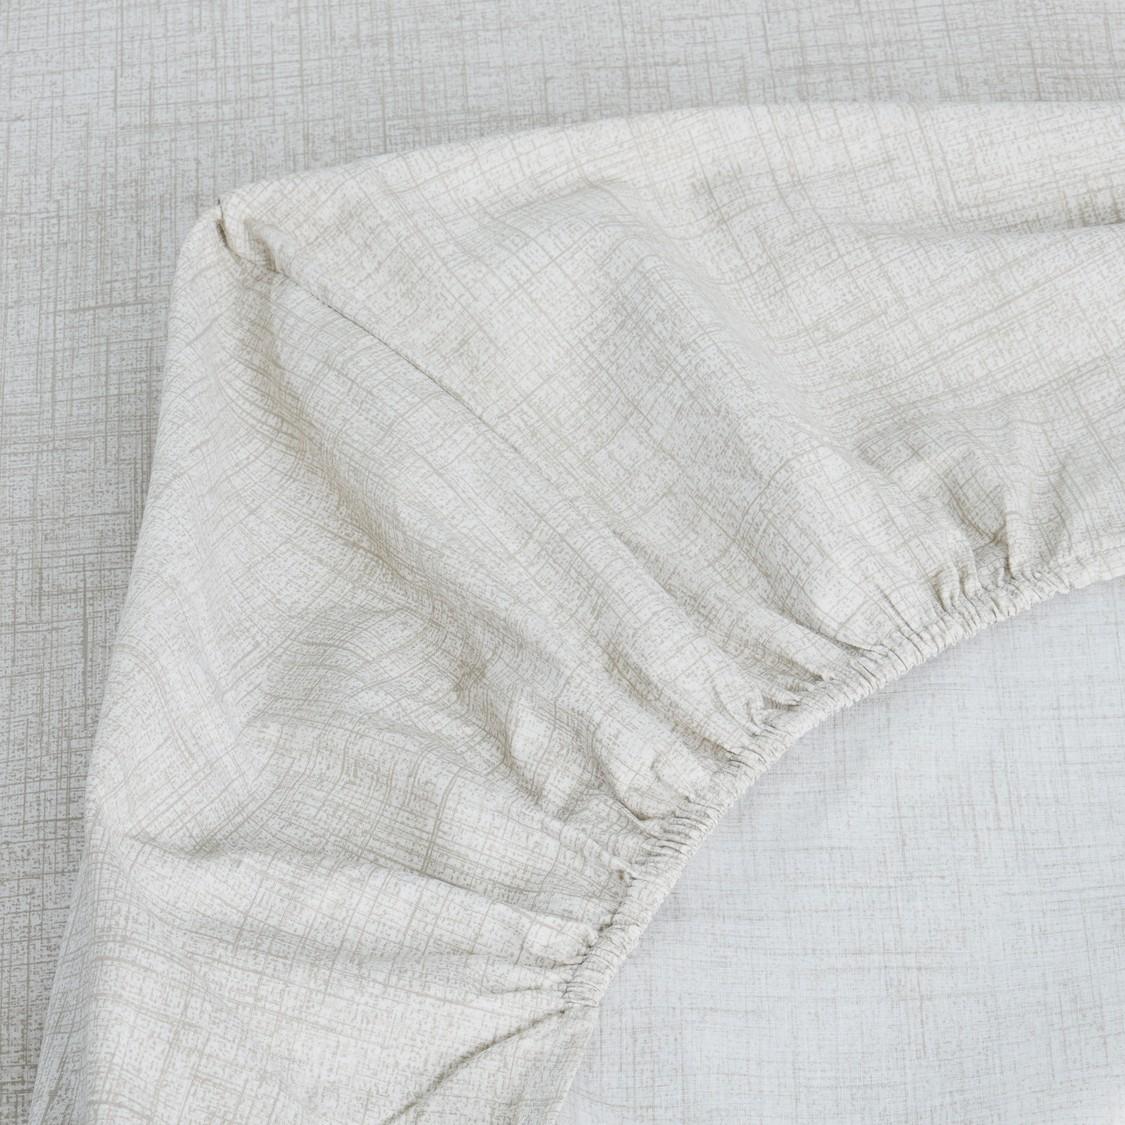 Printed 3-Piece Bedding Set - 200x180 cms